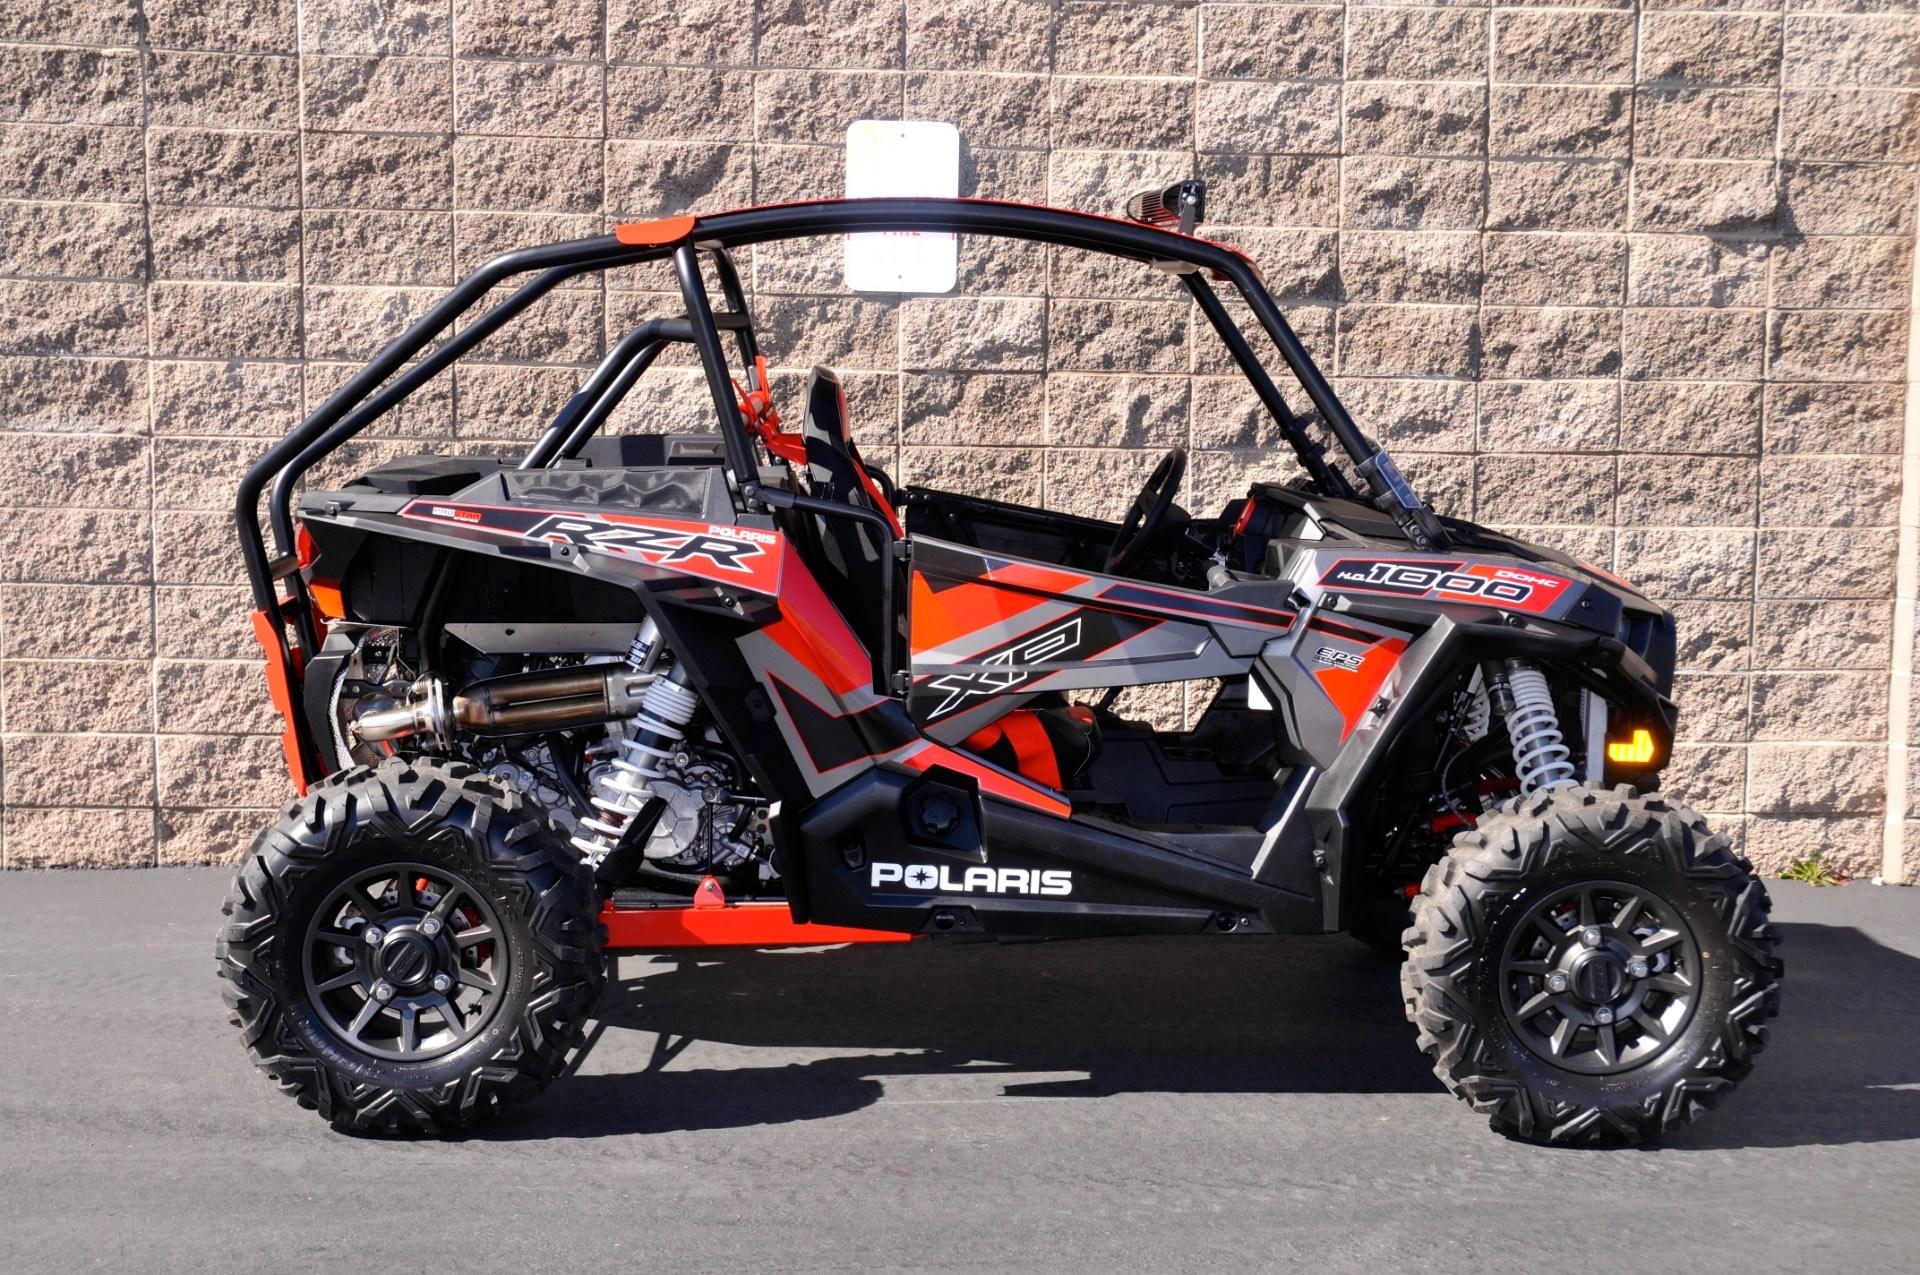 2017 Polaris RZR XP 1000 EPS in Roseville, California